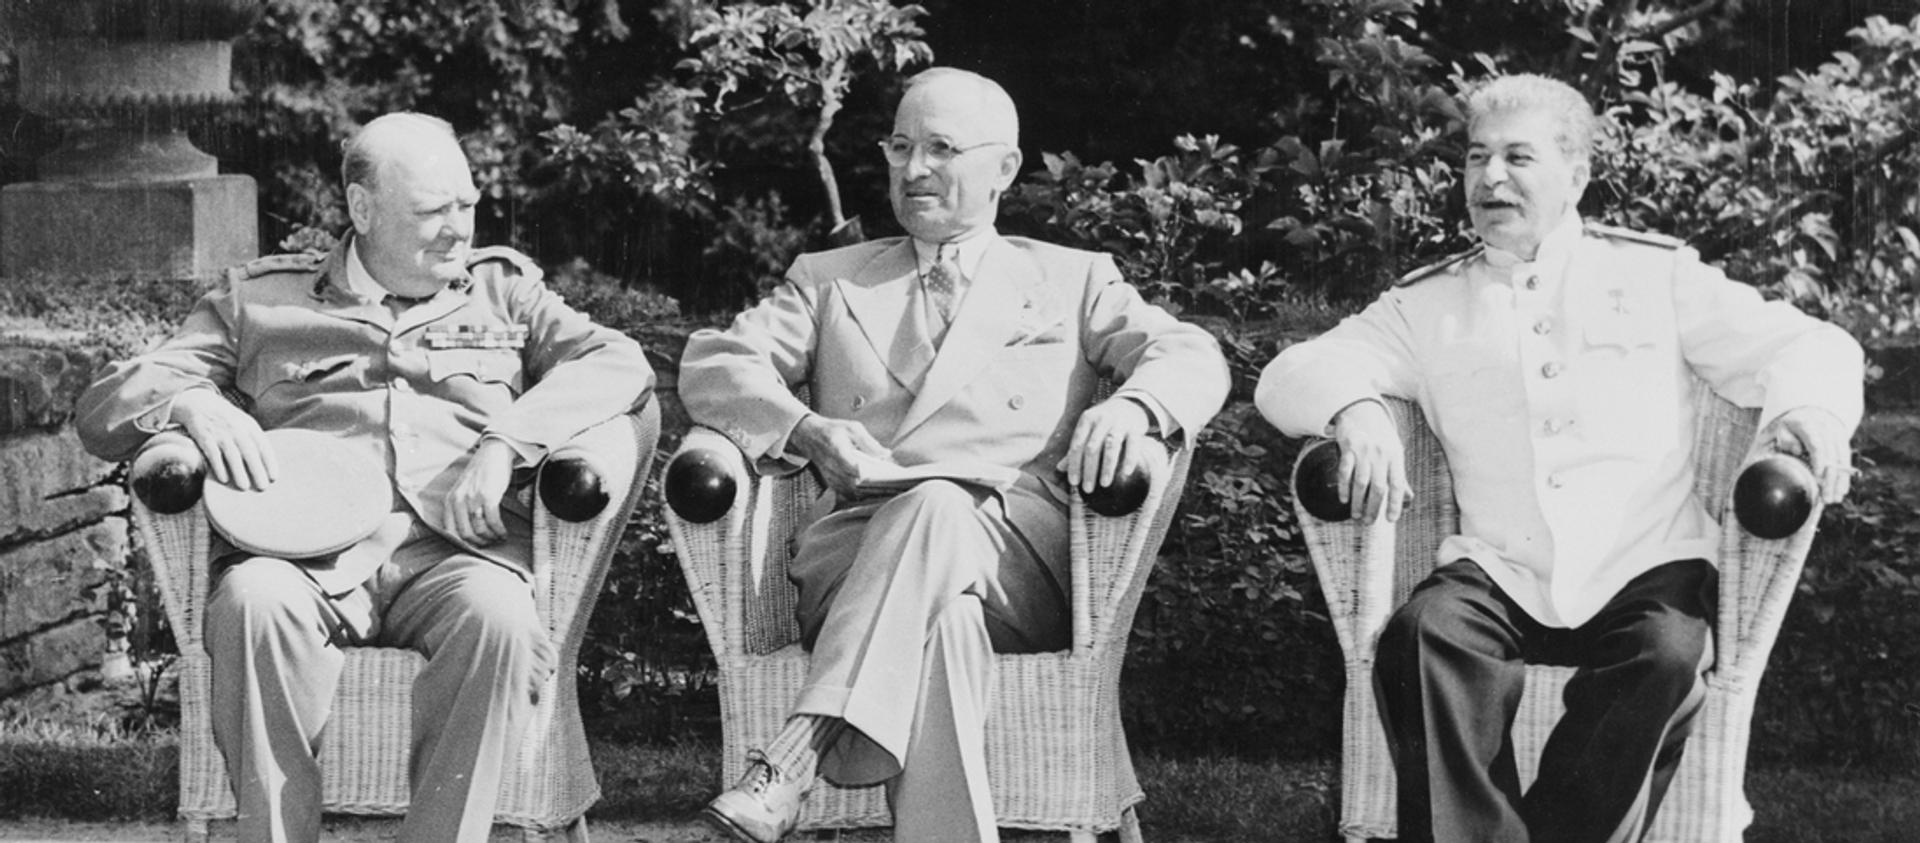 Churchill, Truman y Stalin en Potsdam, 1945 - Sputnik Mundo, 1920, 17.07.2020